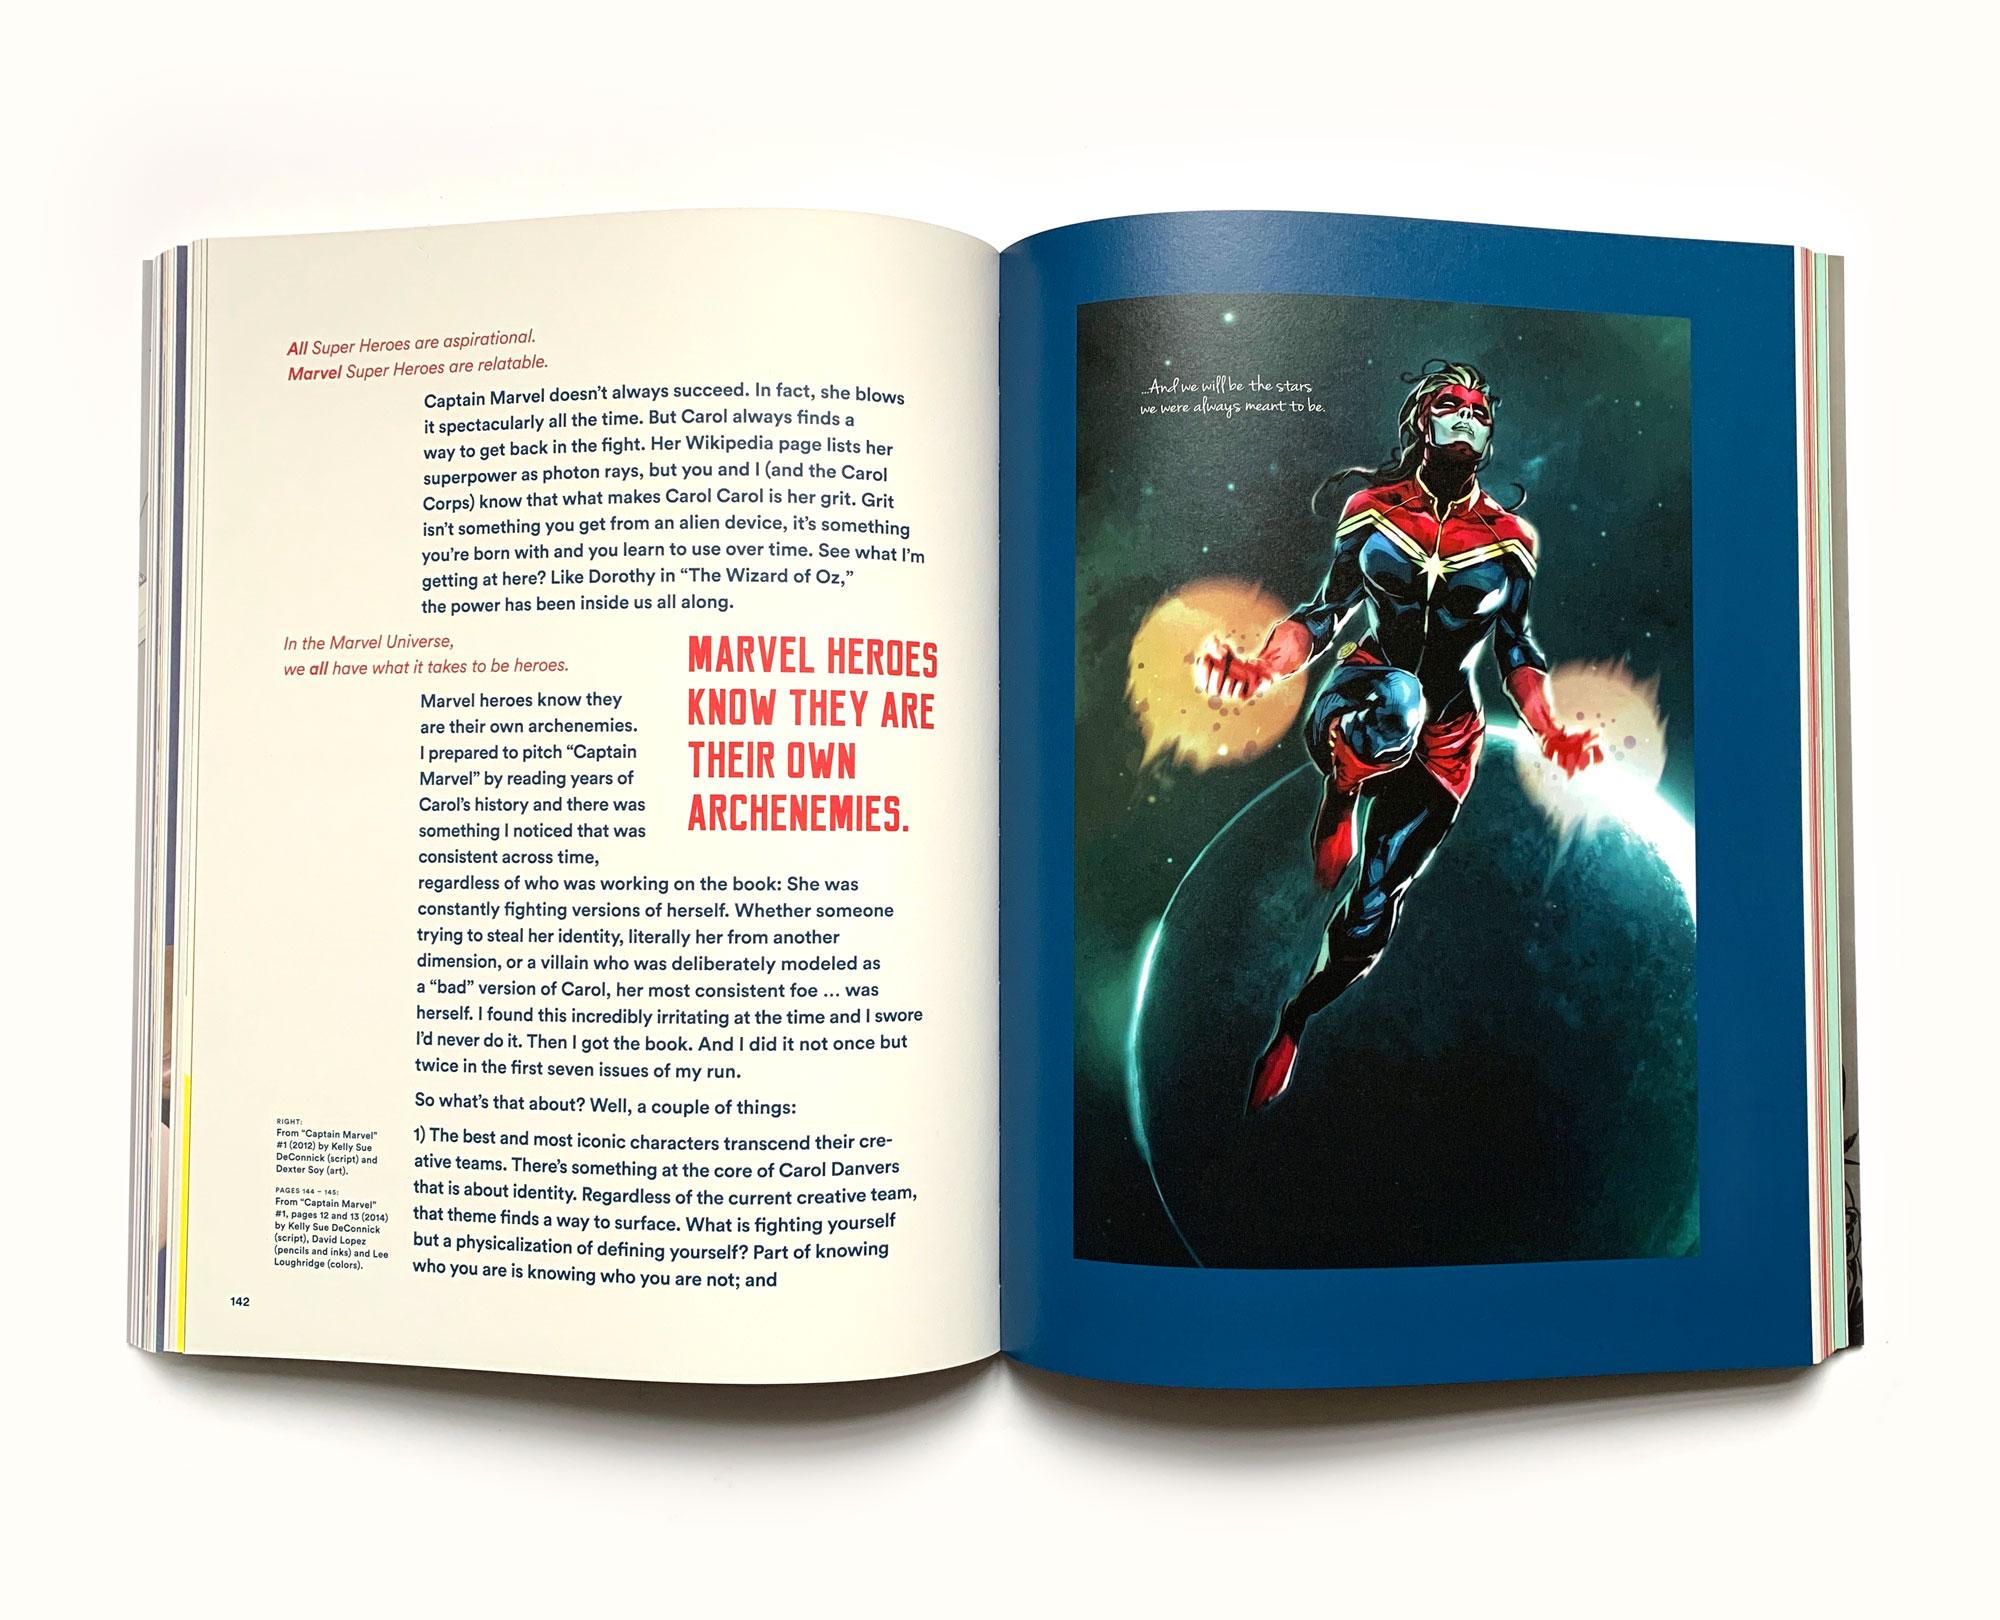 Marvel-Universe-of-Super-Heroes-Book-MrsMarvel-Balgavy.jpg